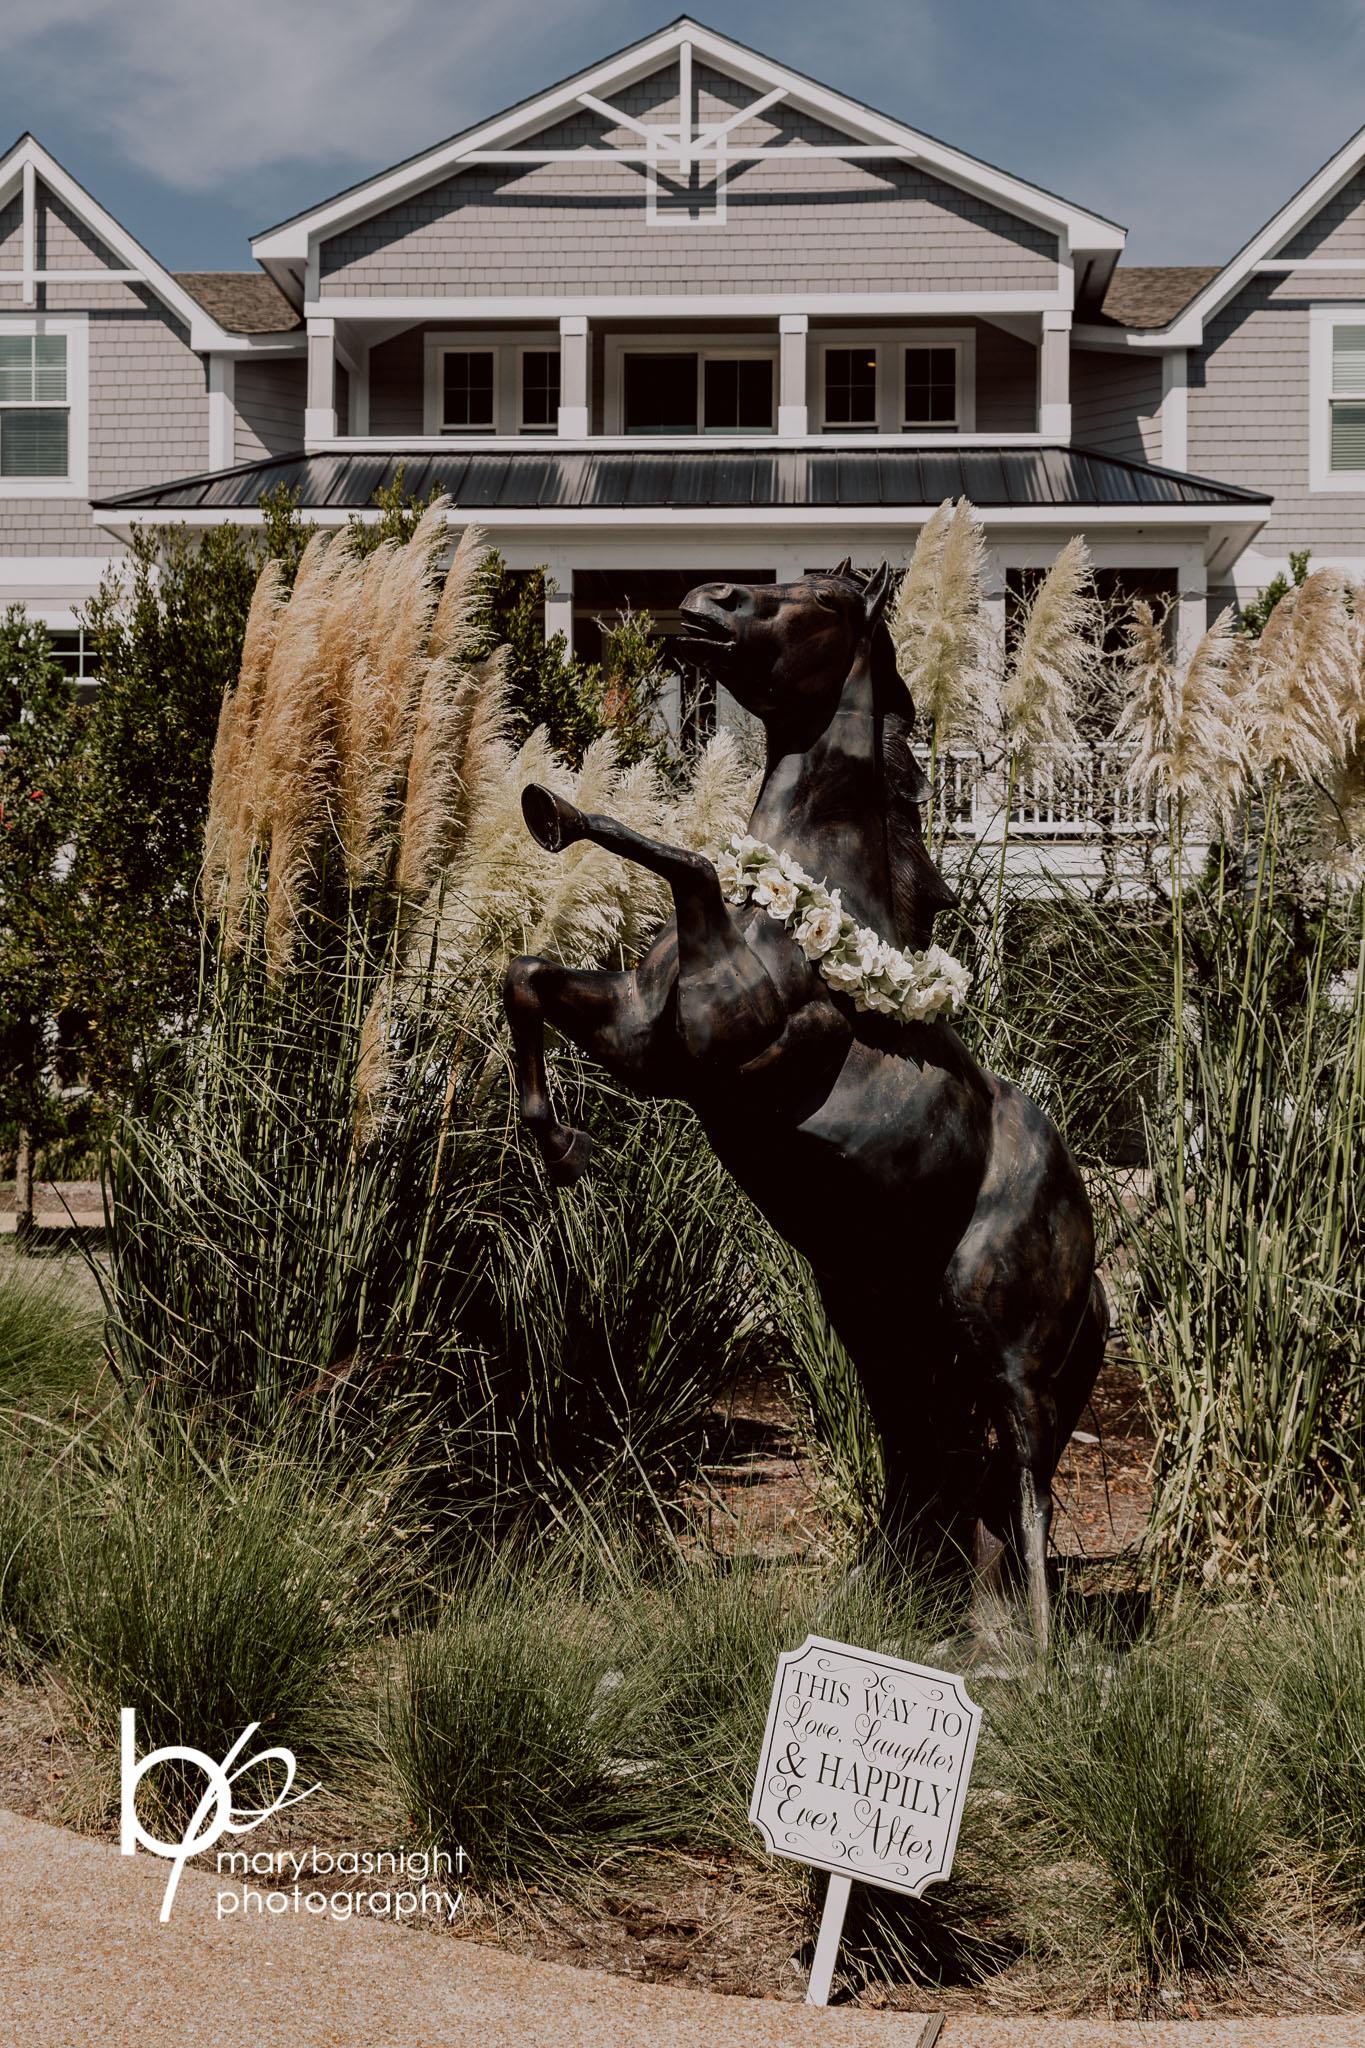 The Black Stallion - Details